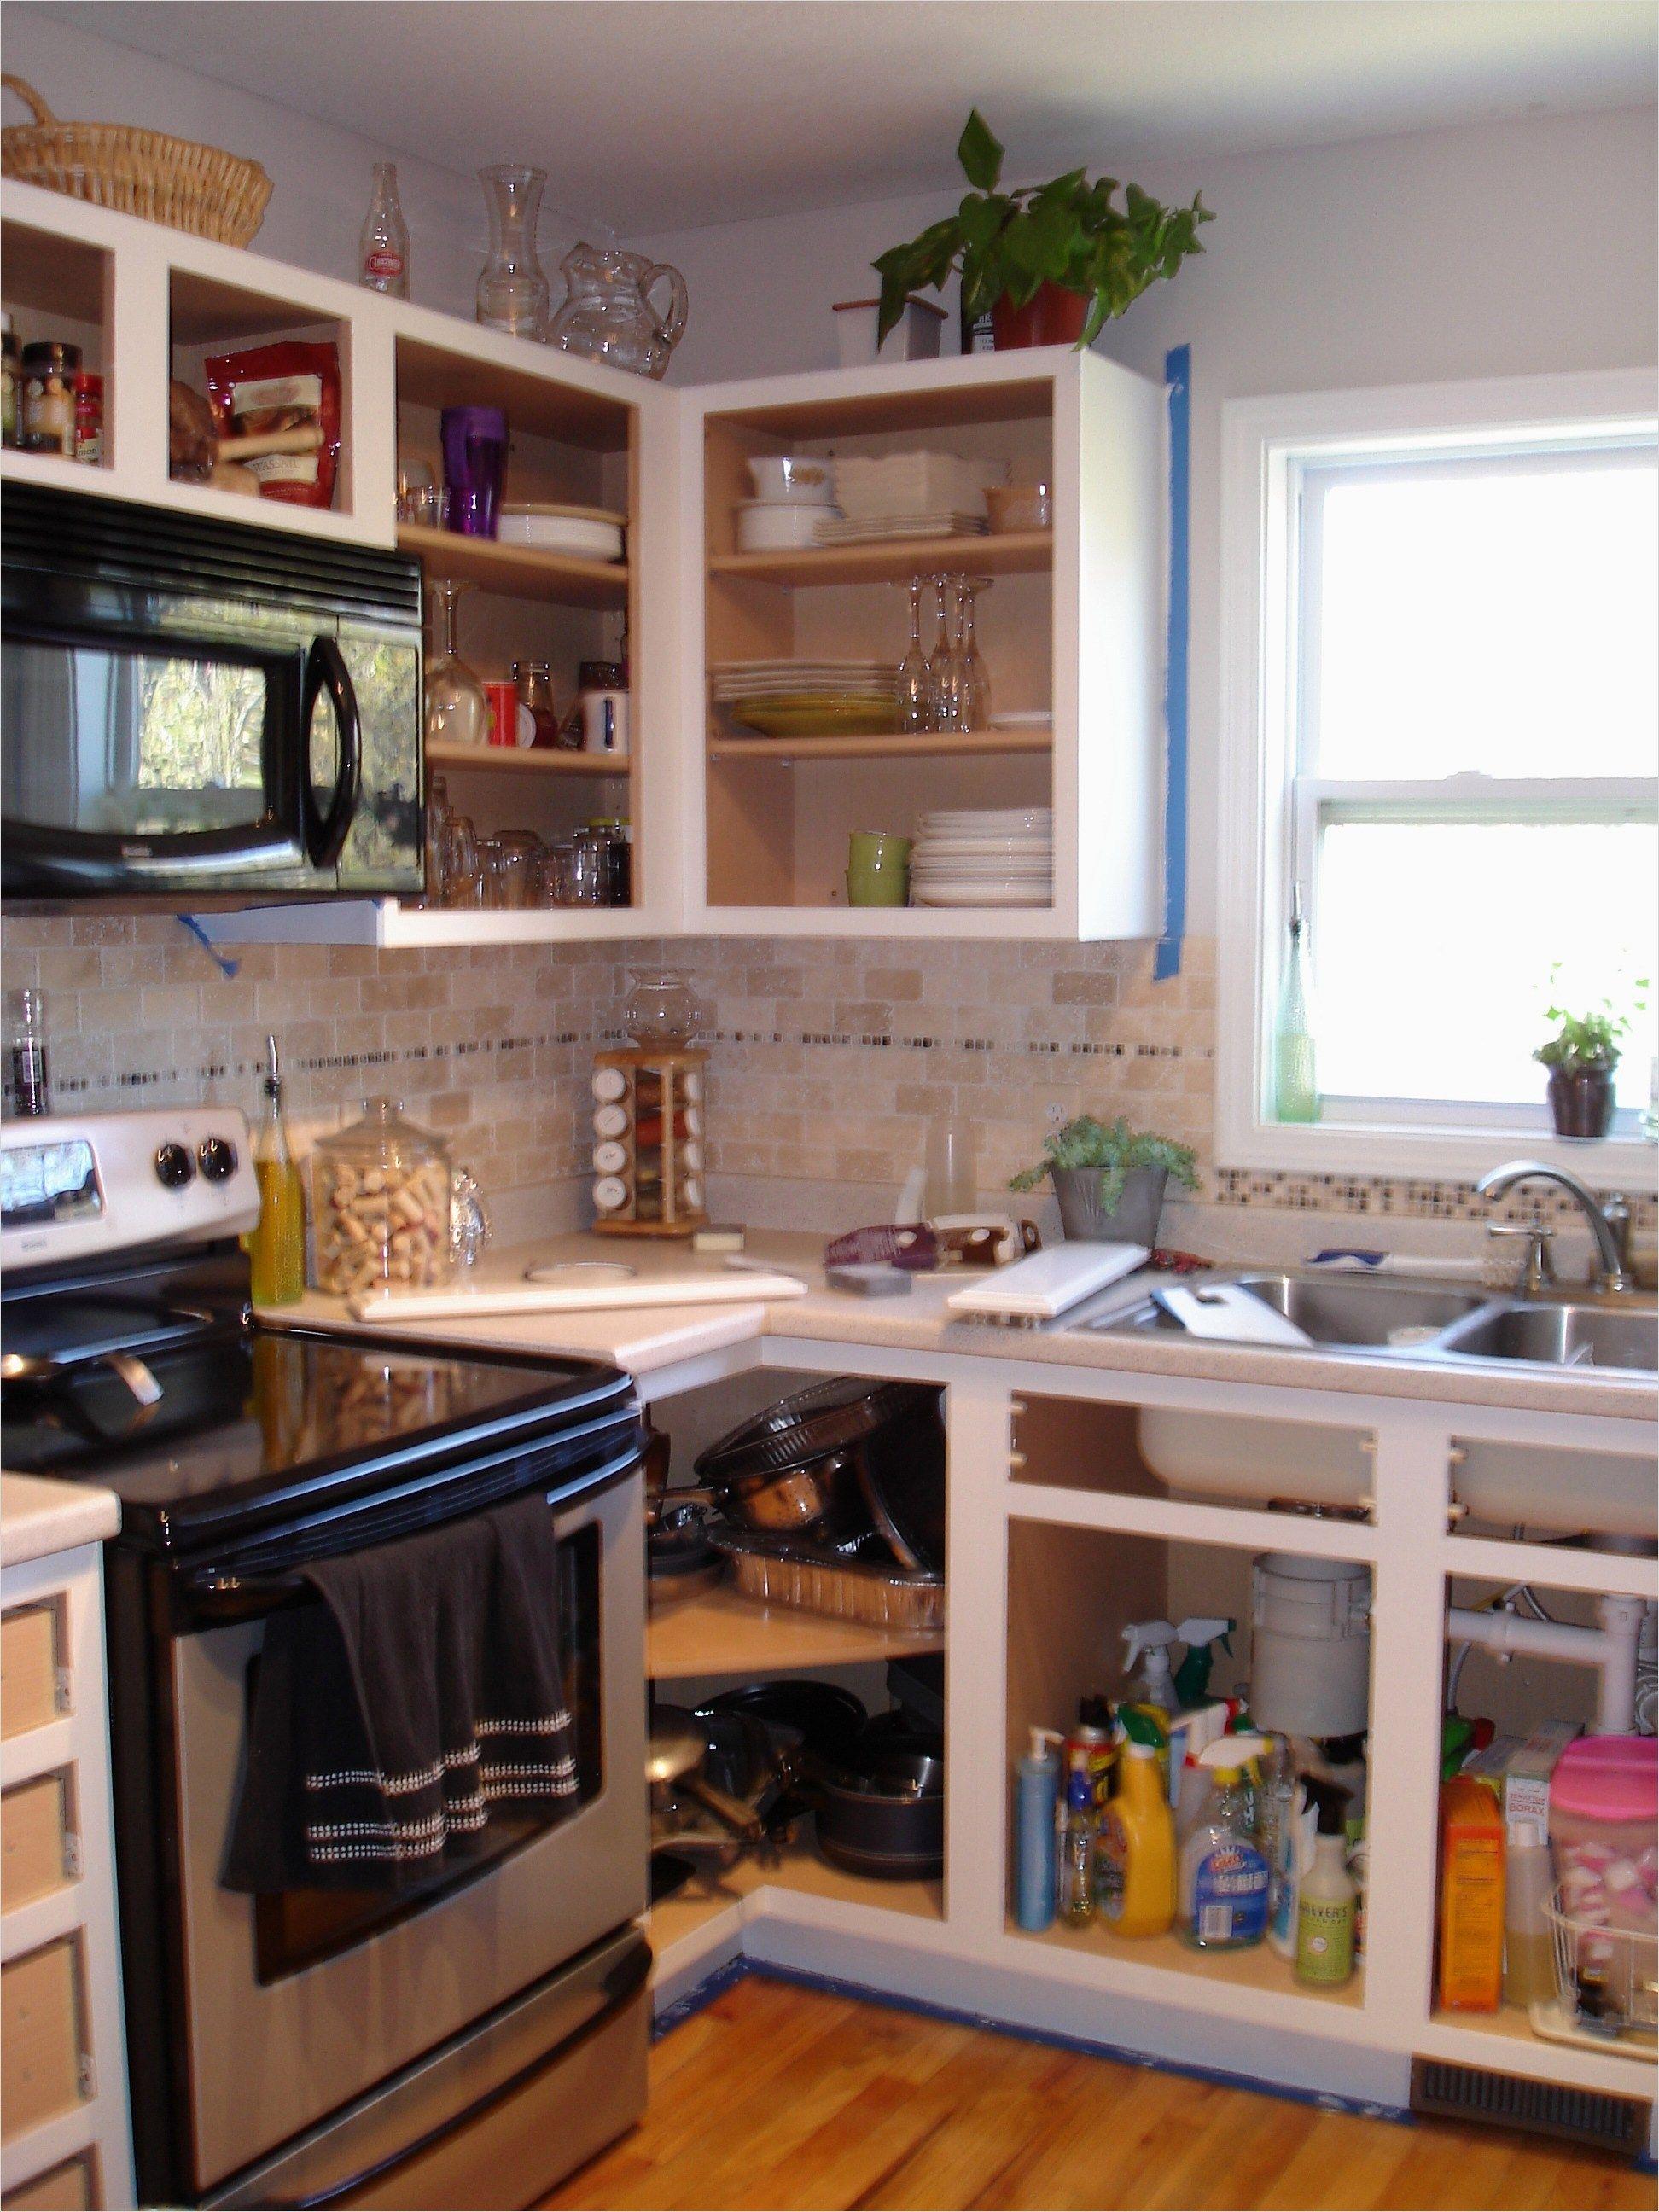 9 Stylish Ideas Minimalist Kitchen Shelves That Will Make Your ...